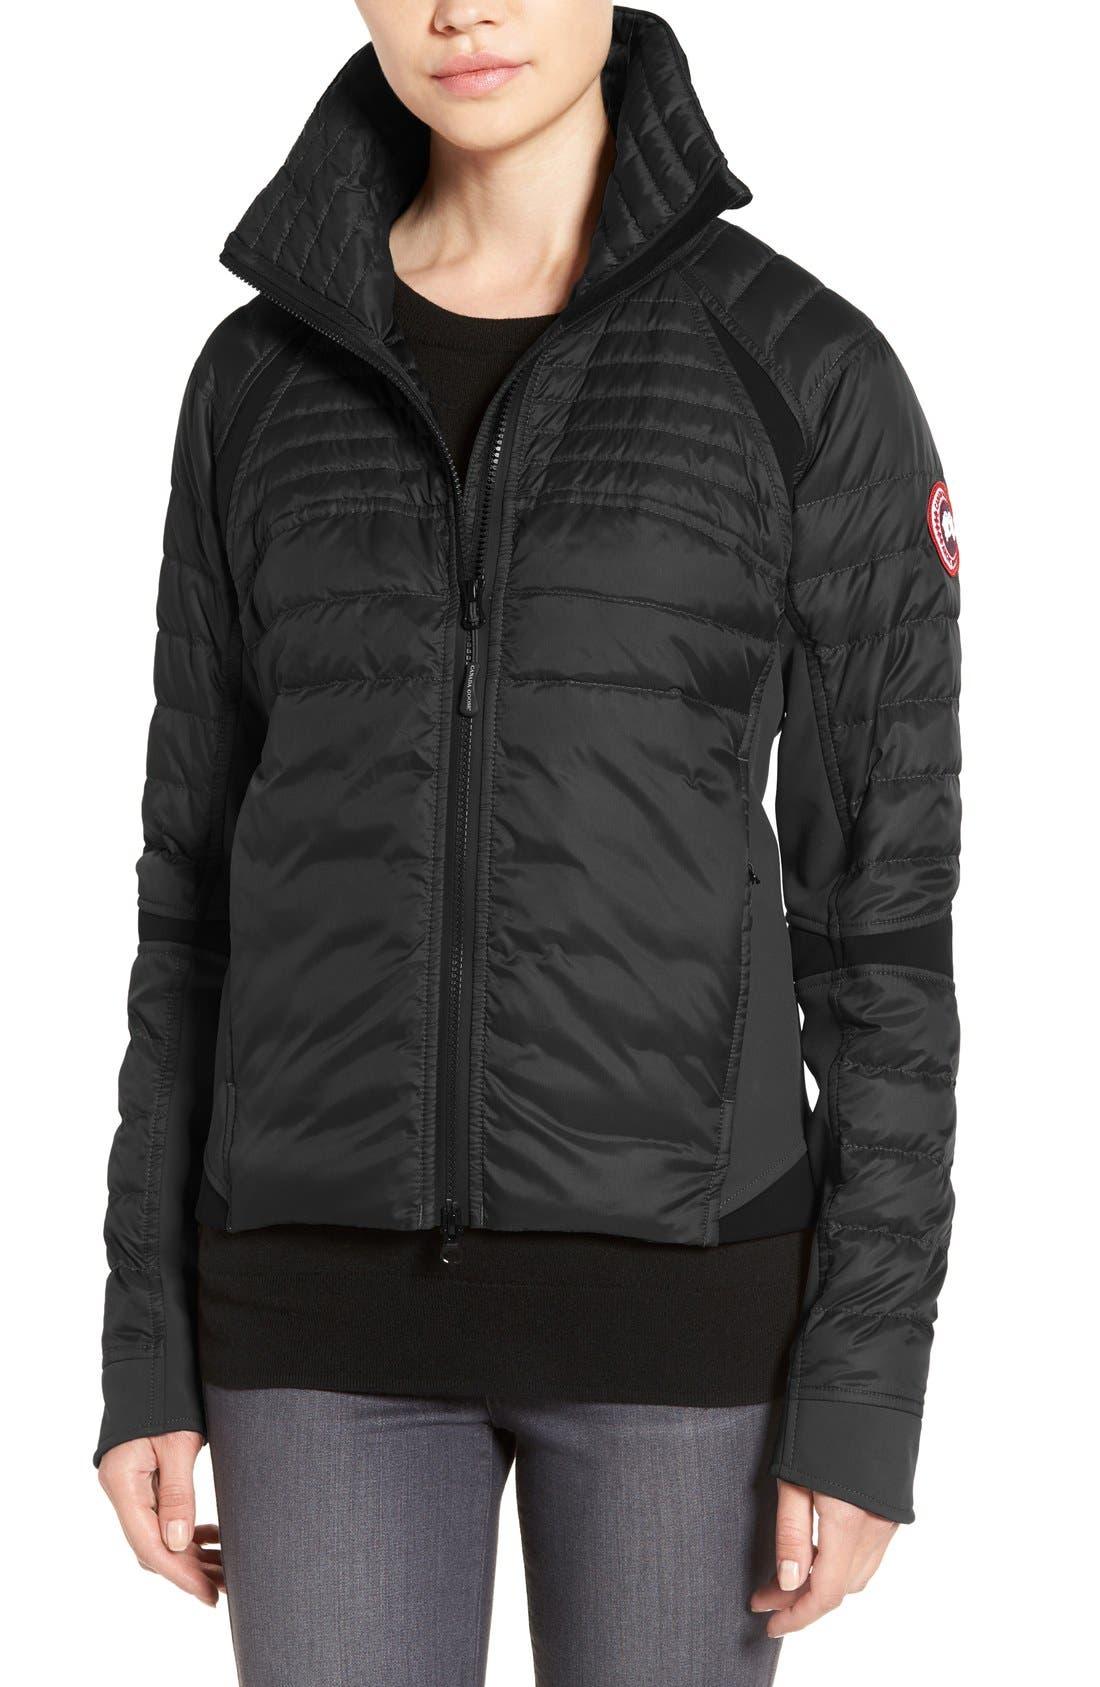 CANADA GOOSE, Hybridge Perren Jacket, Main thumbnail 1, color, BLACK